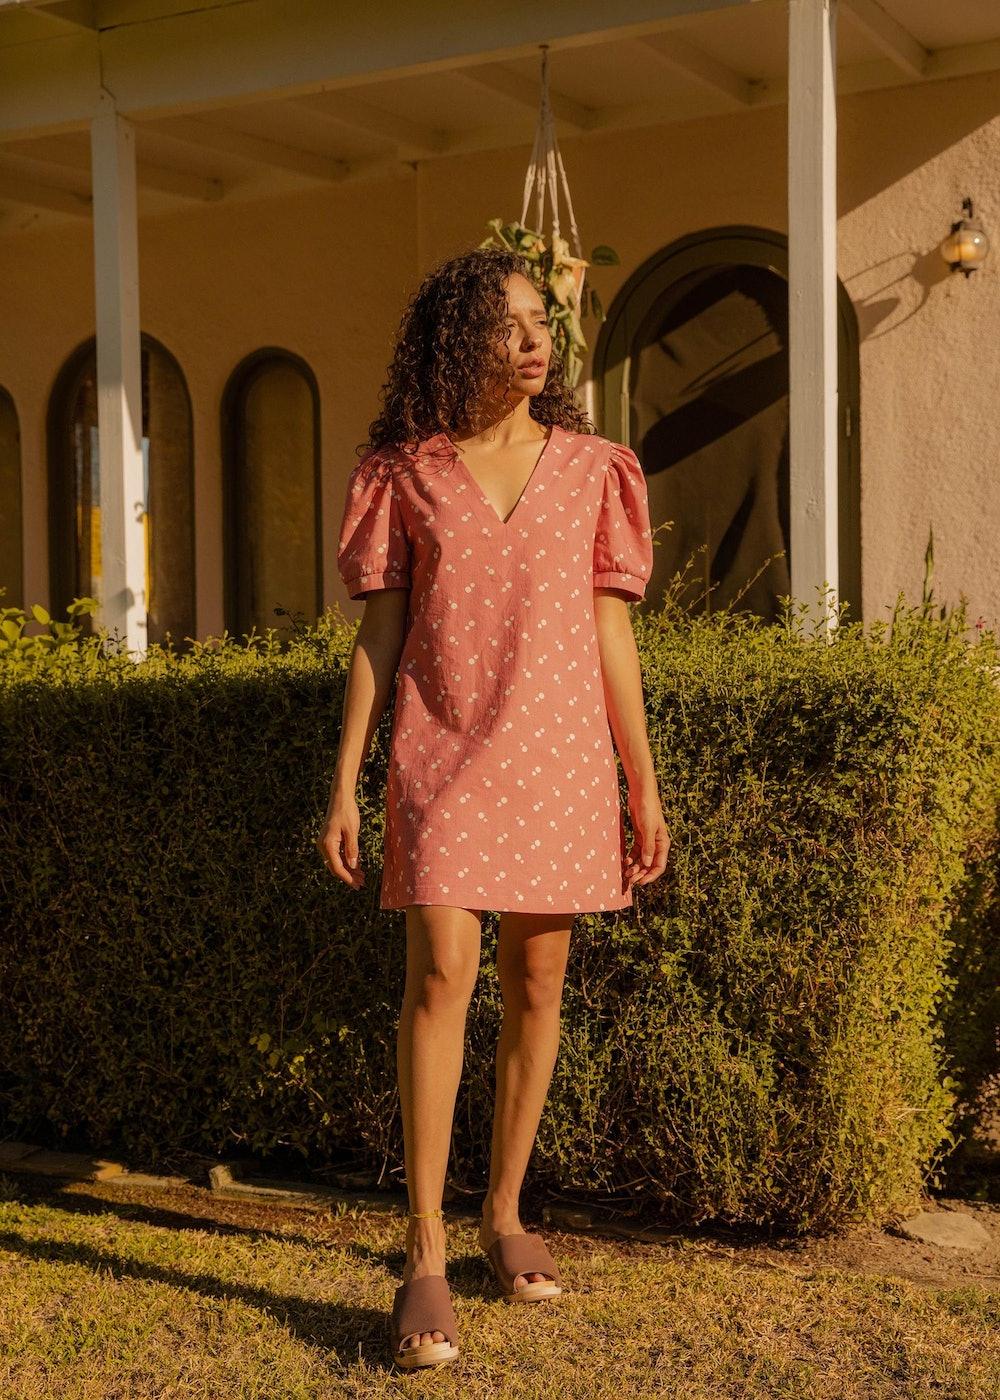 The Polka Pink Dress